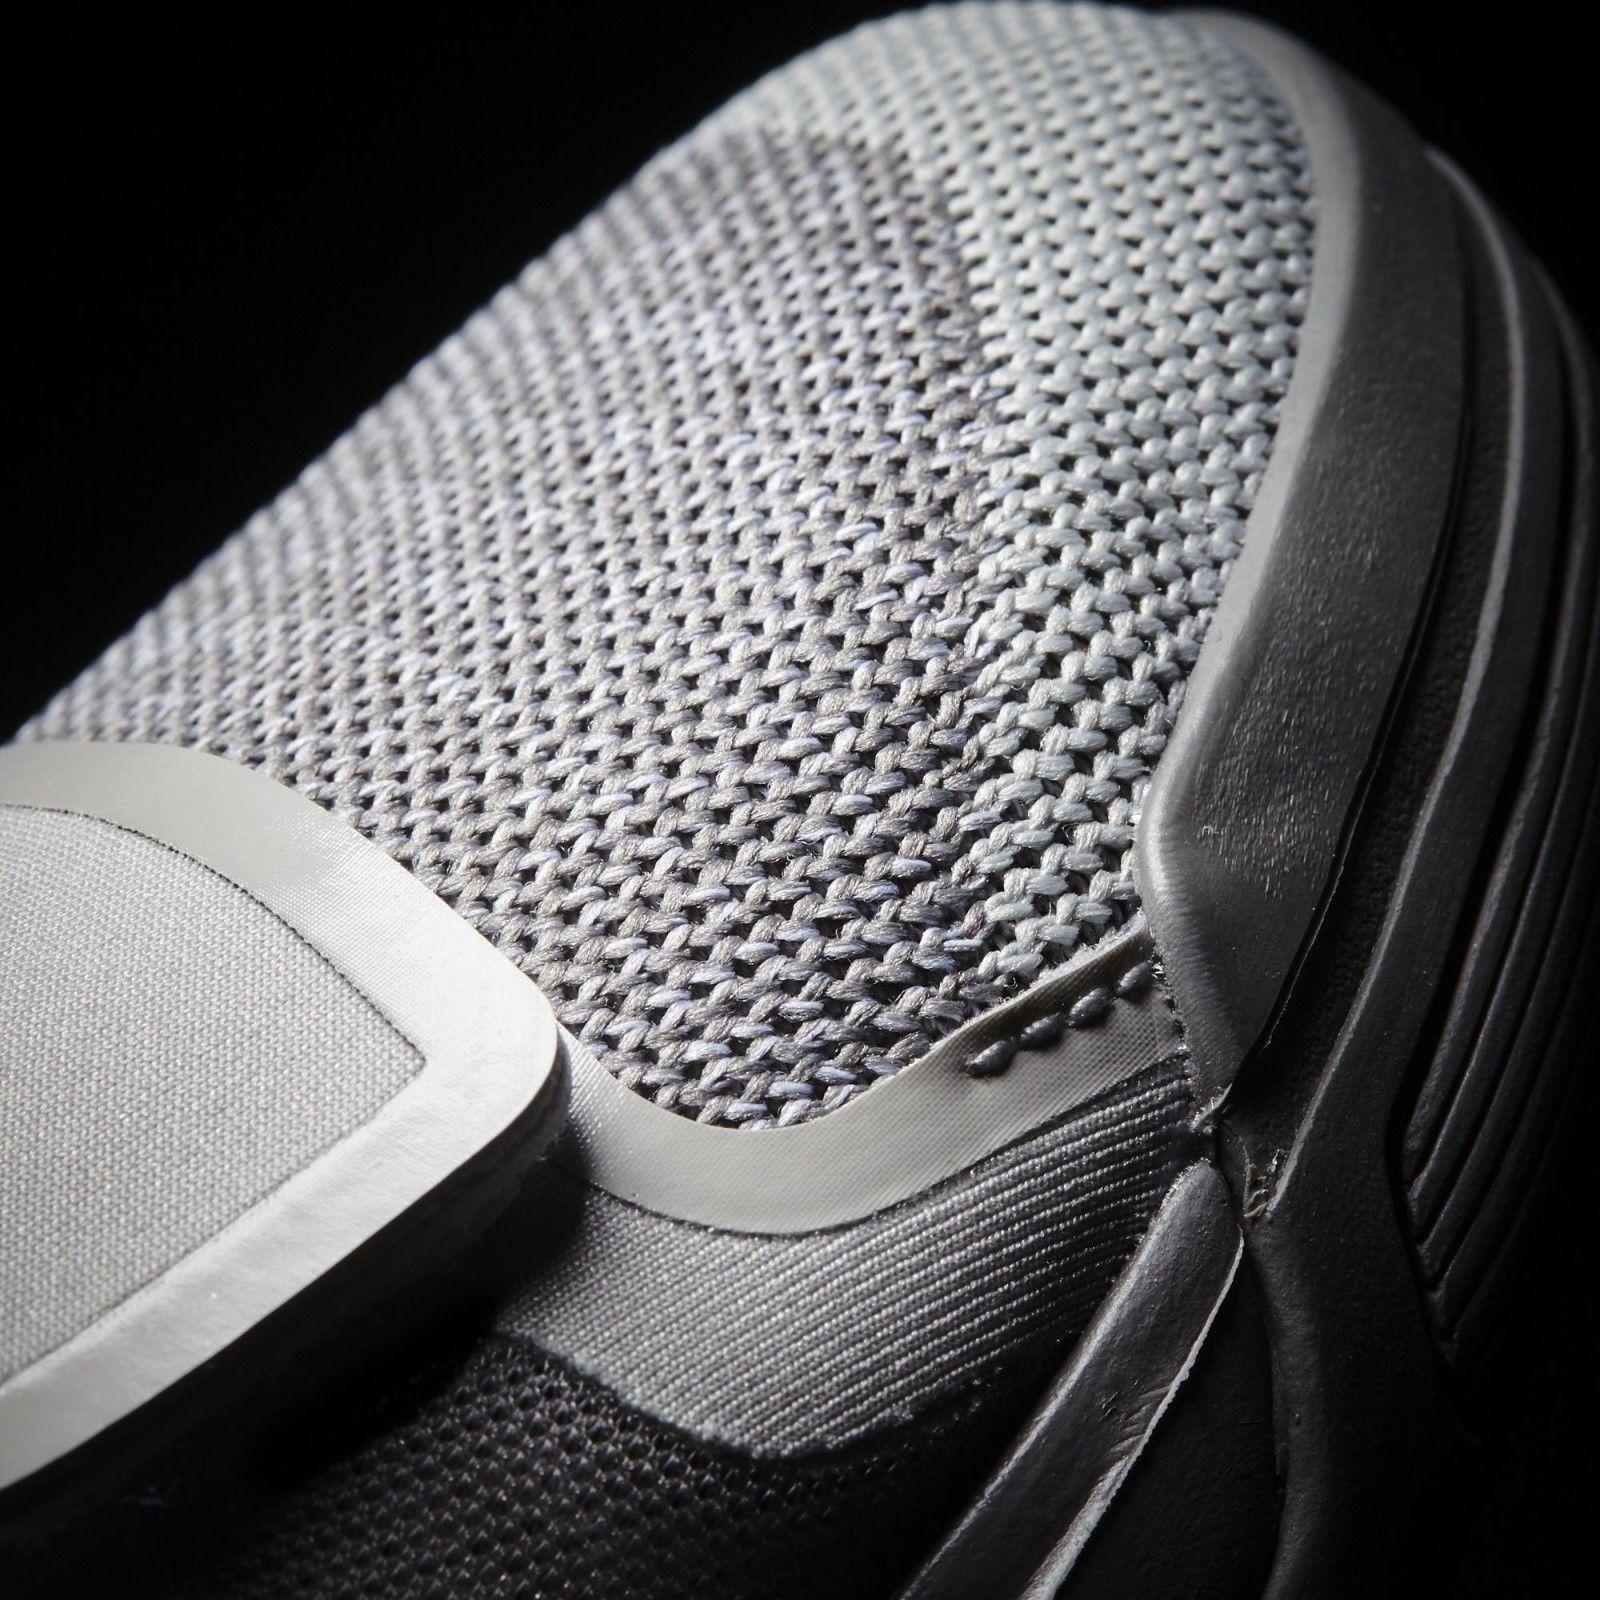 Adidas Outdoor botas Terrex ax2r Mid GTX botas Outdoor de senderismo negro / negro ae9319